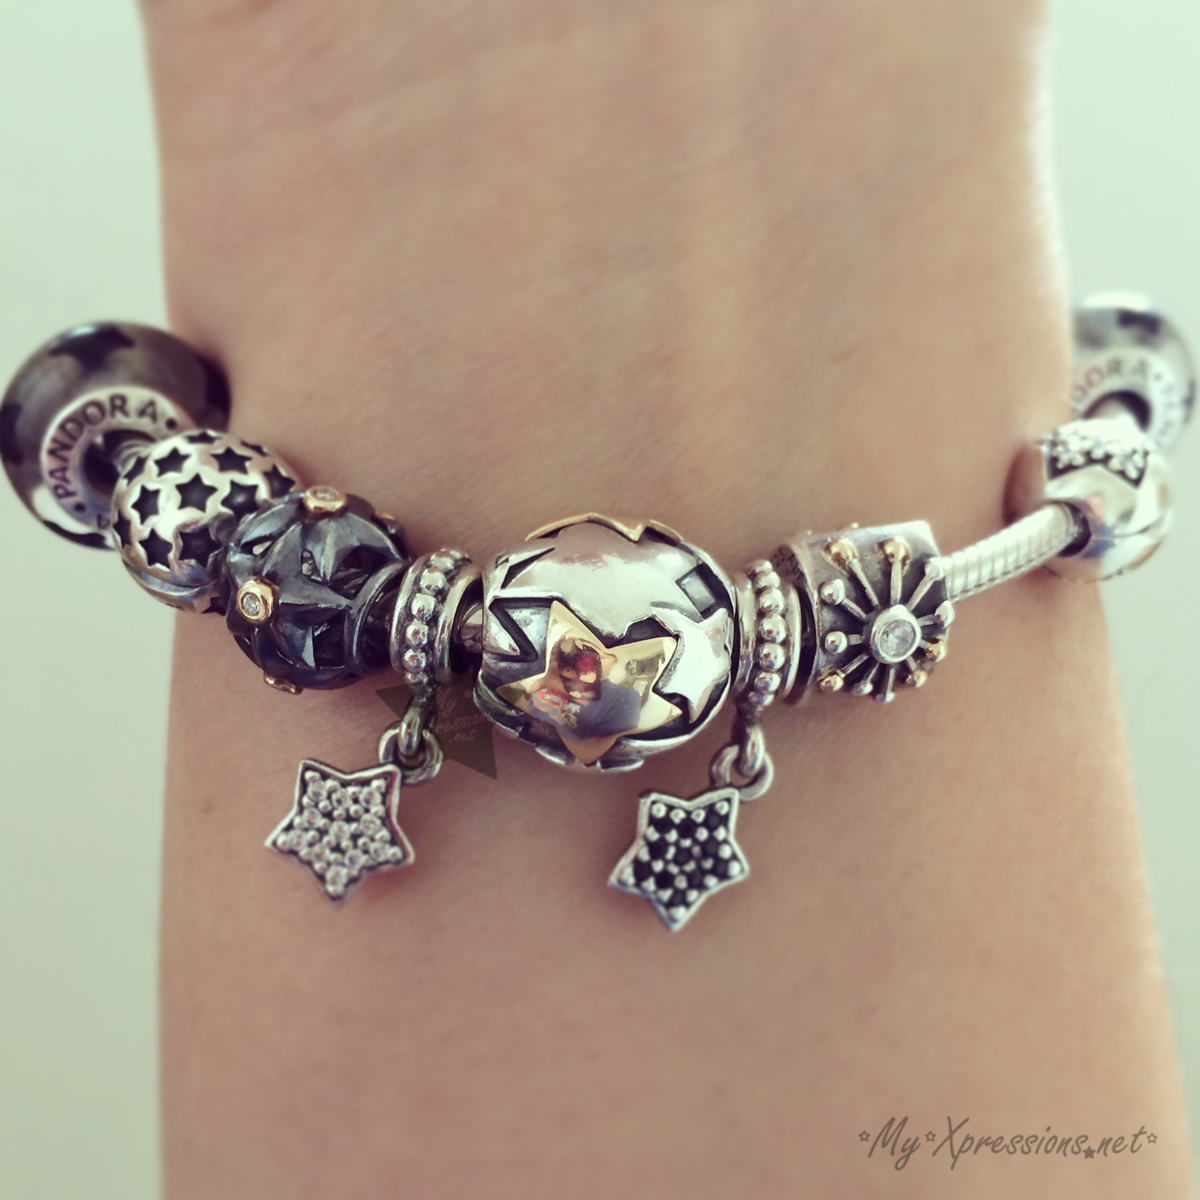 Pandora compatible bead pandora bracelet iders pandora charms